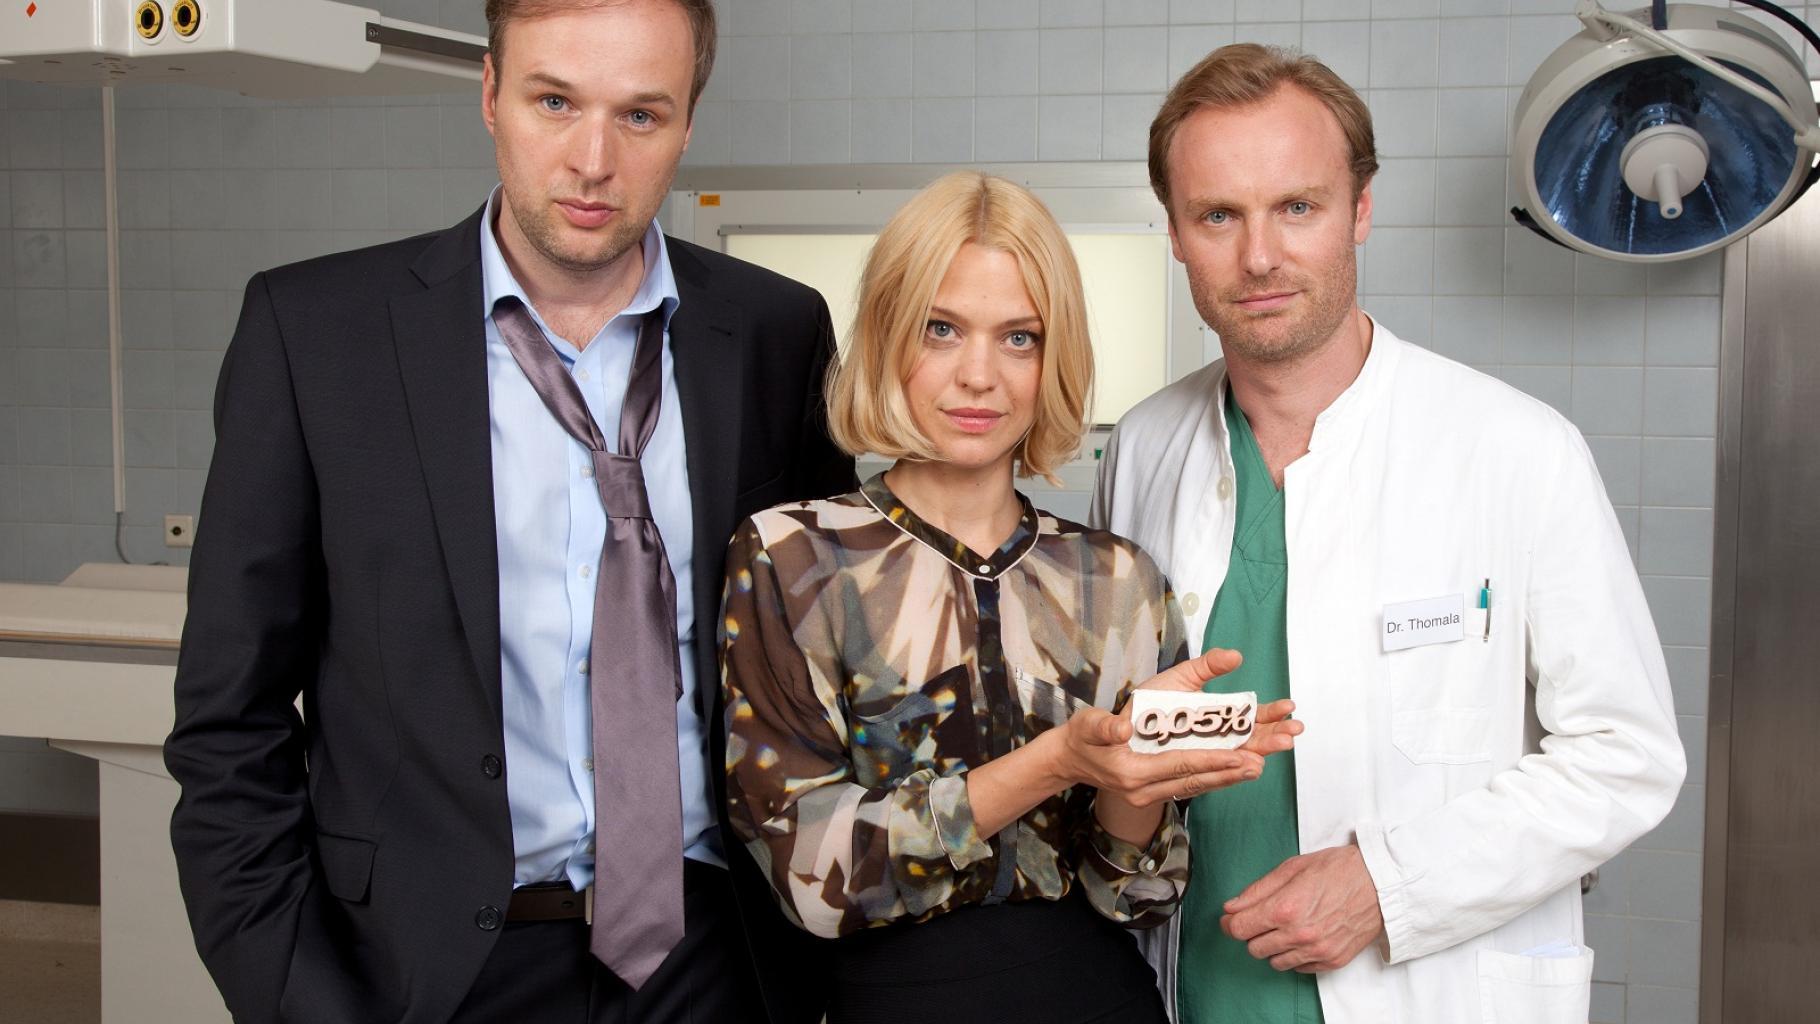 Stephan Grossmann, Heike Makatsch und Mark Waschke im neuen Oxfam-Video.